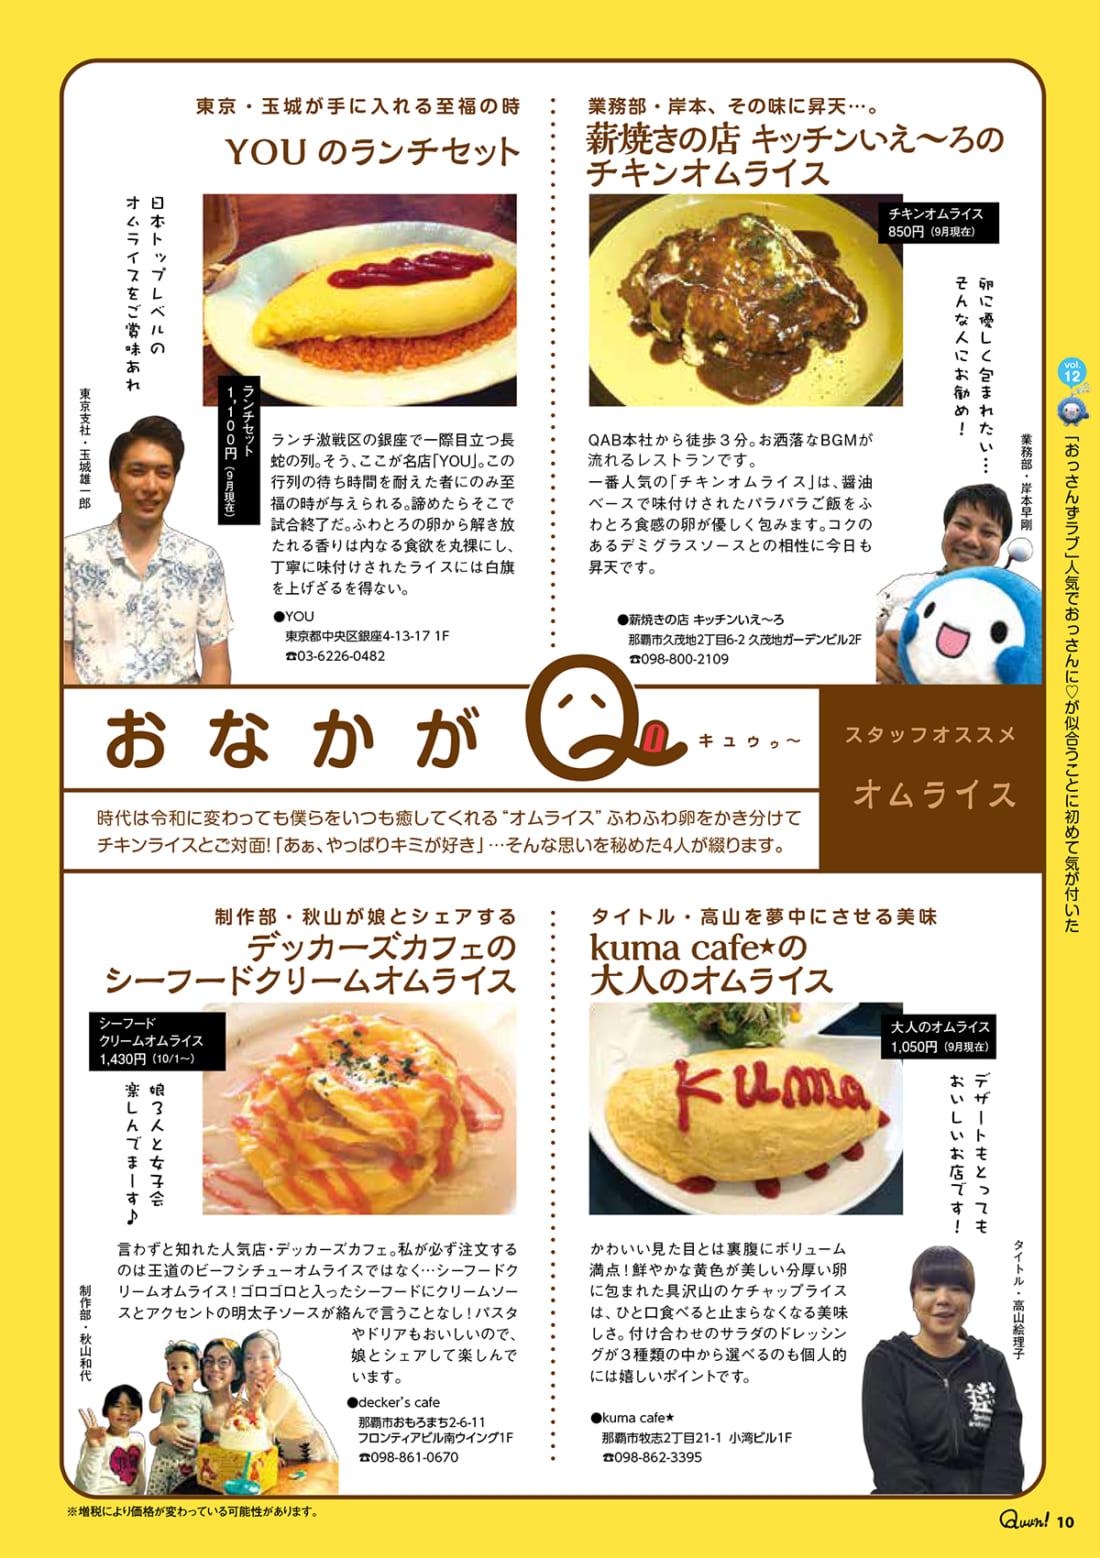 https://www.qab.co.jp/qgoro/wp-content/uploads/quun_1212-1100x1558.jpg